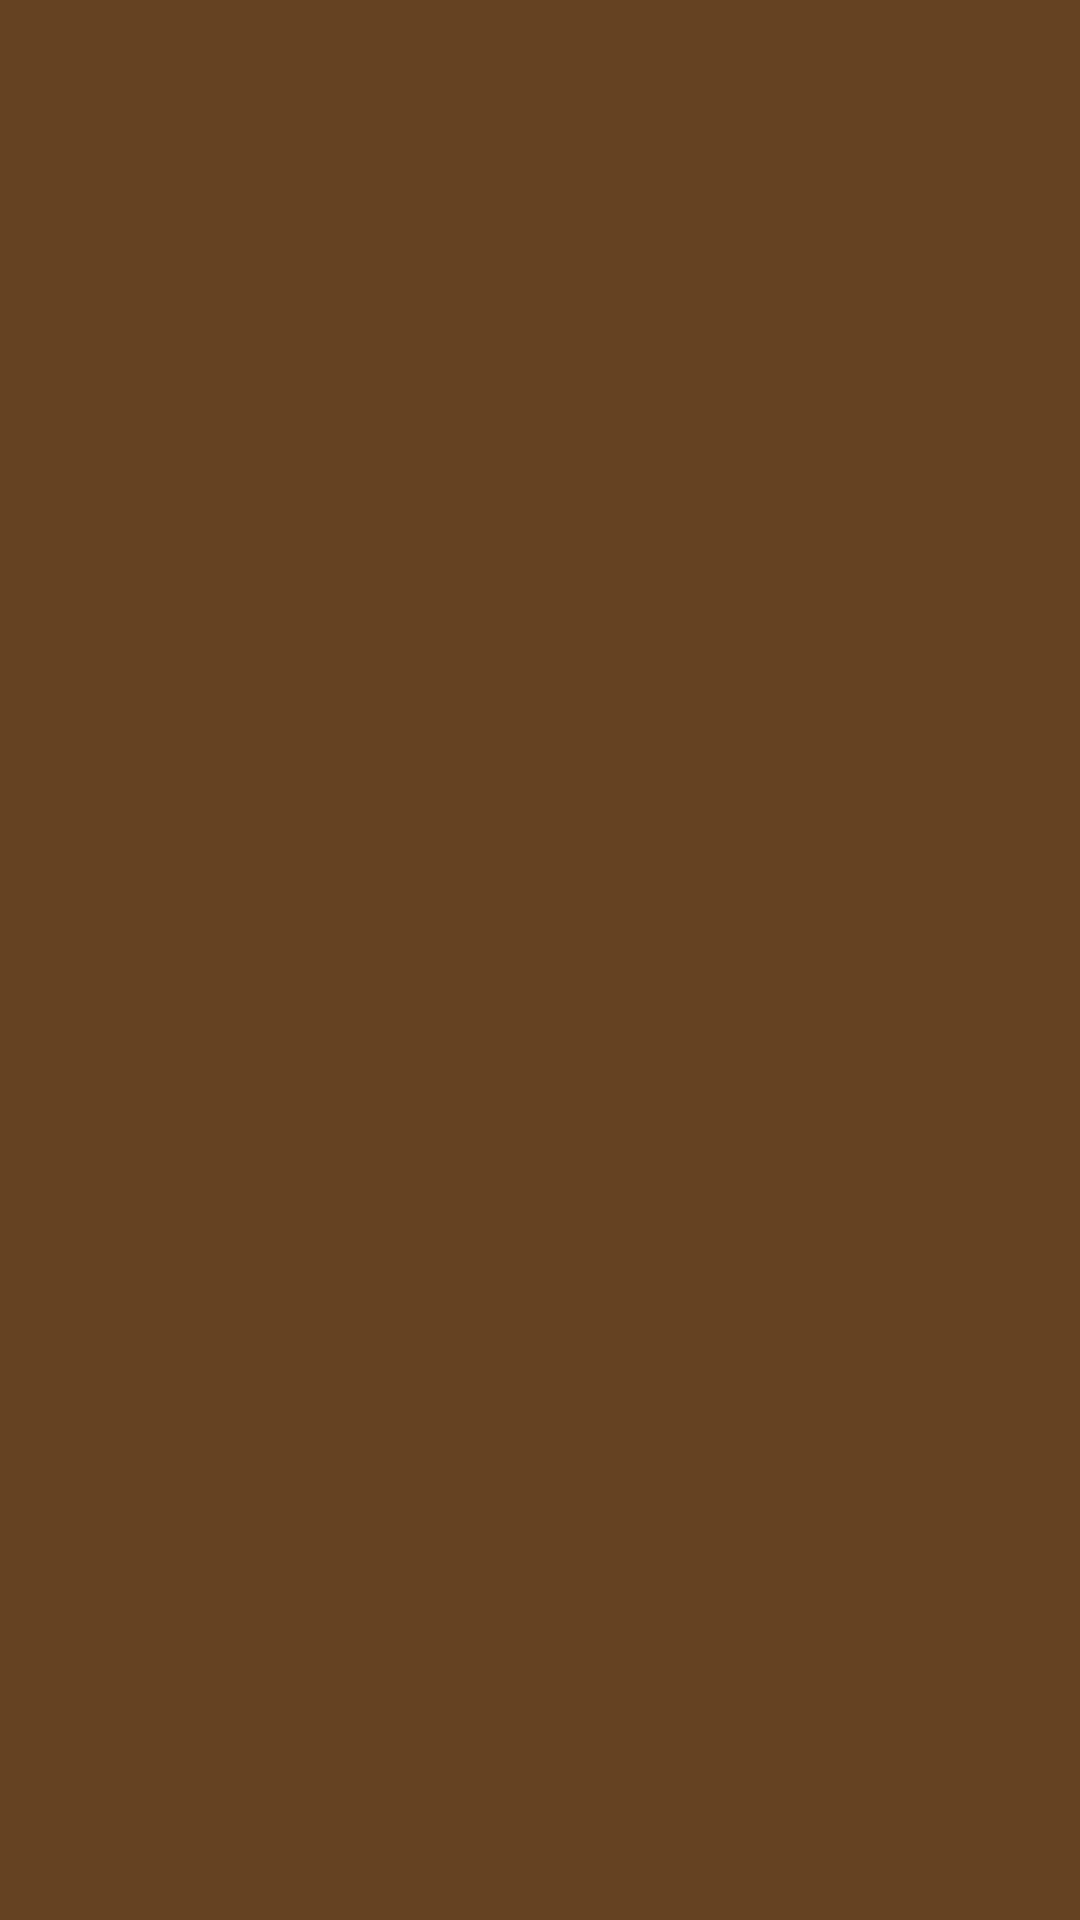 1080x1920 Dark Brown Solid Color Background